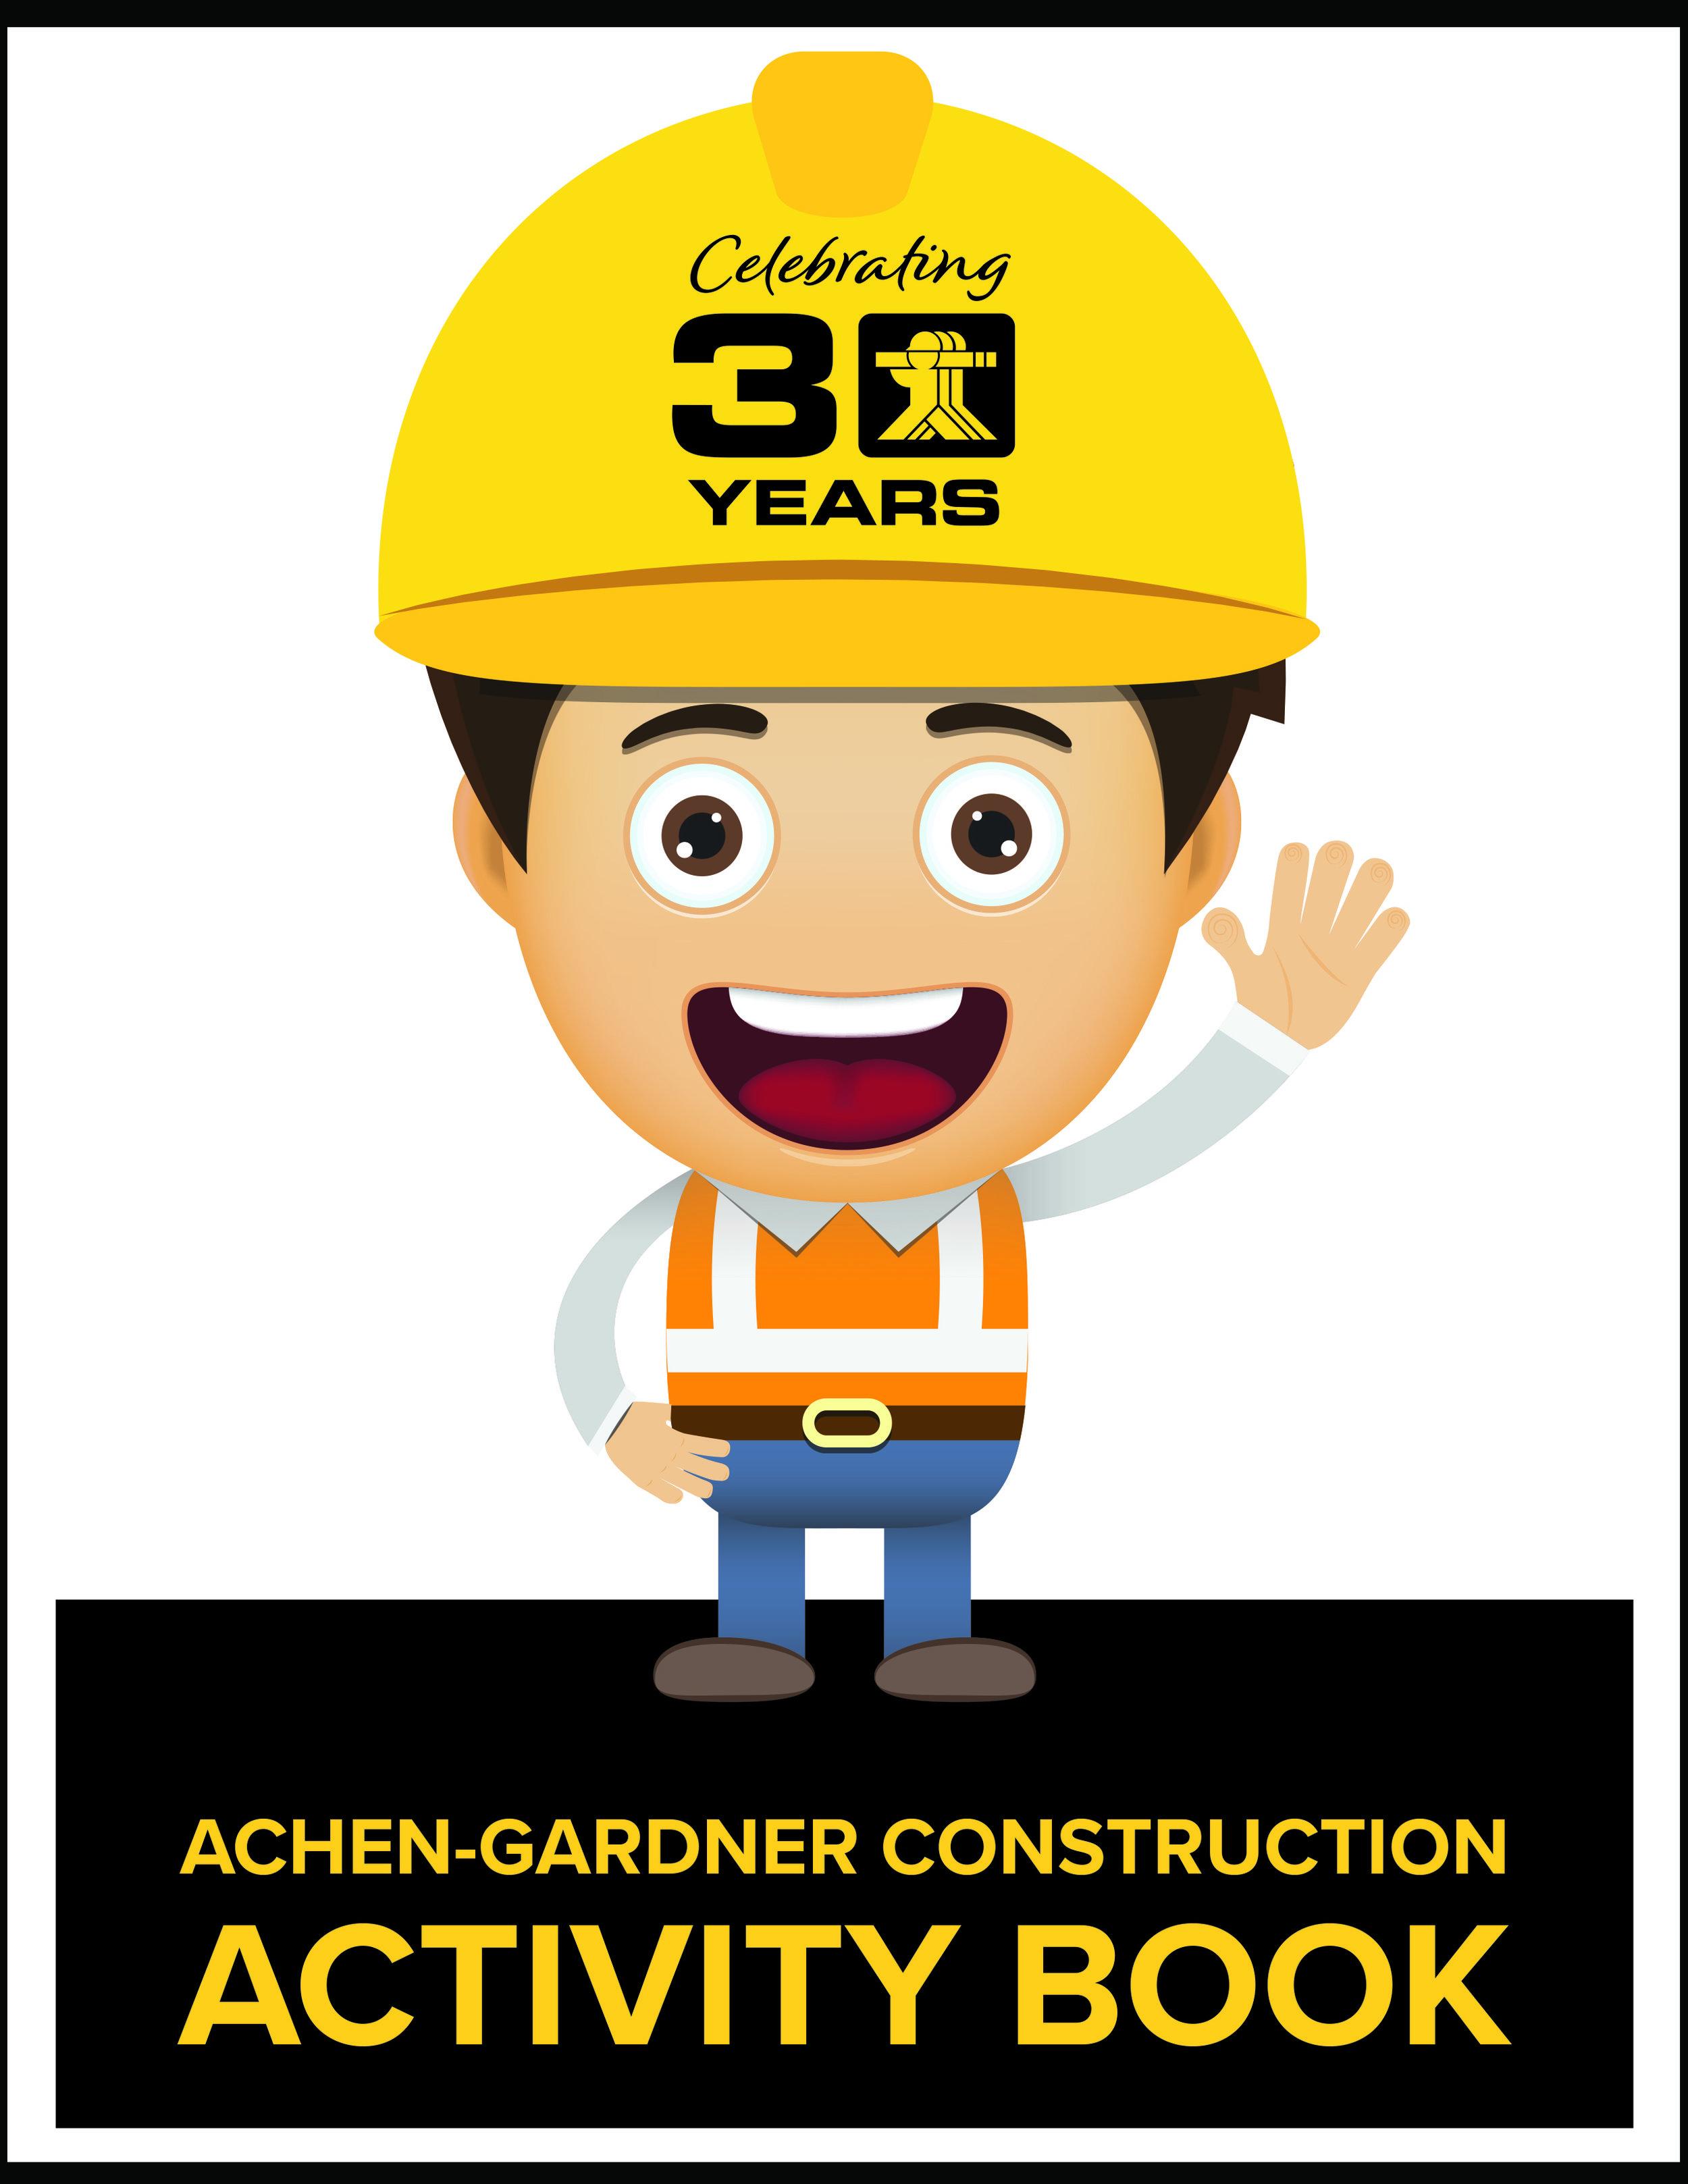 Achen-Gardner Construction Activity Book 2019-coveroutline.jpg